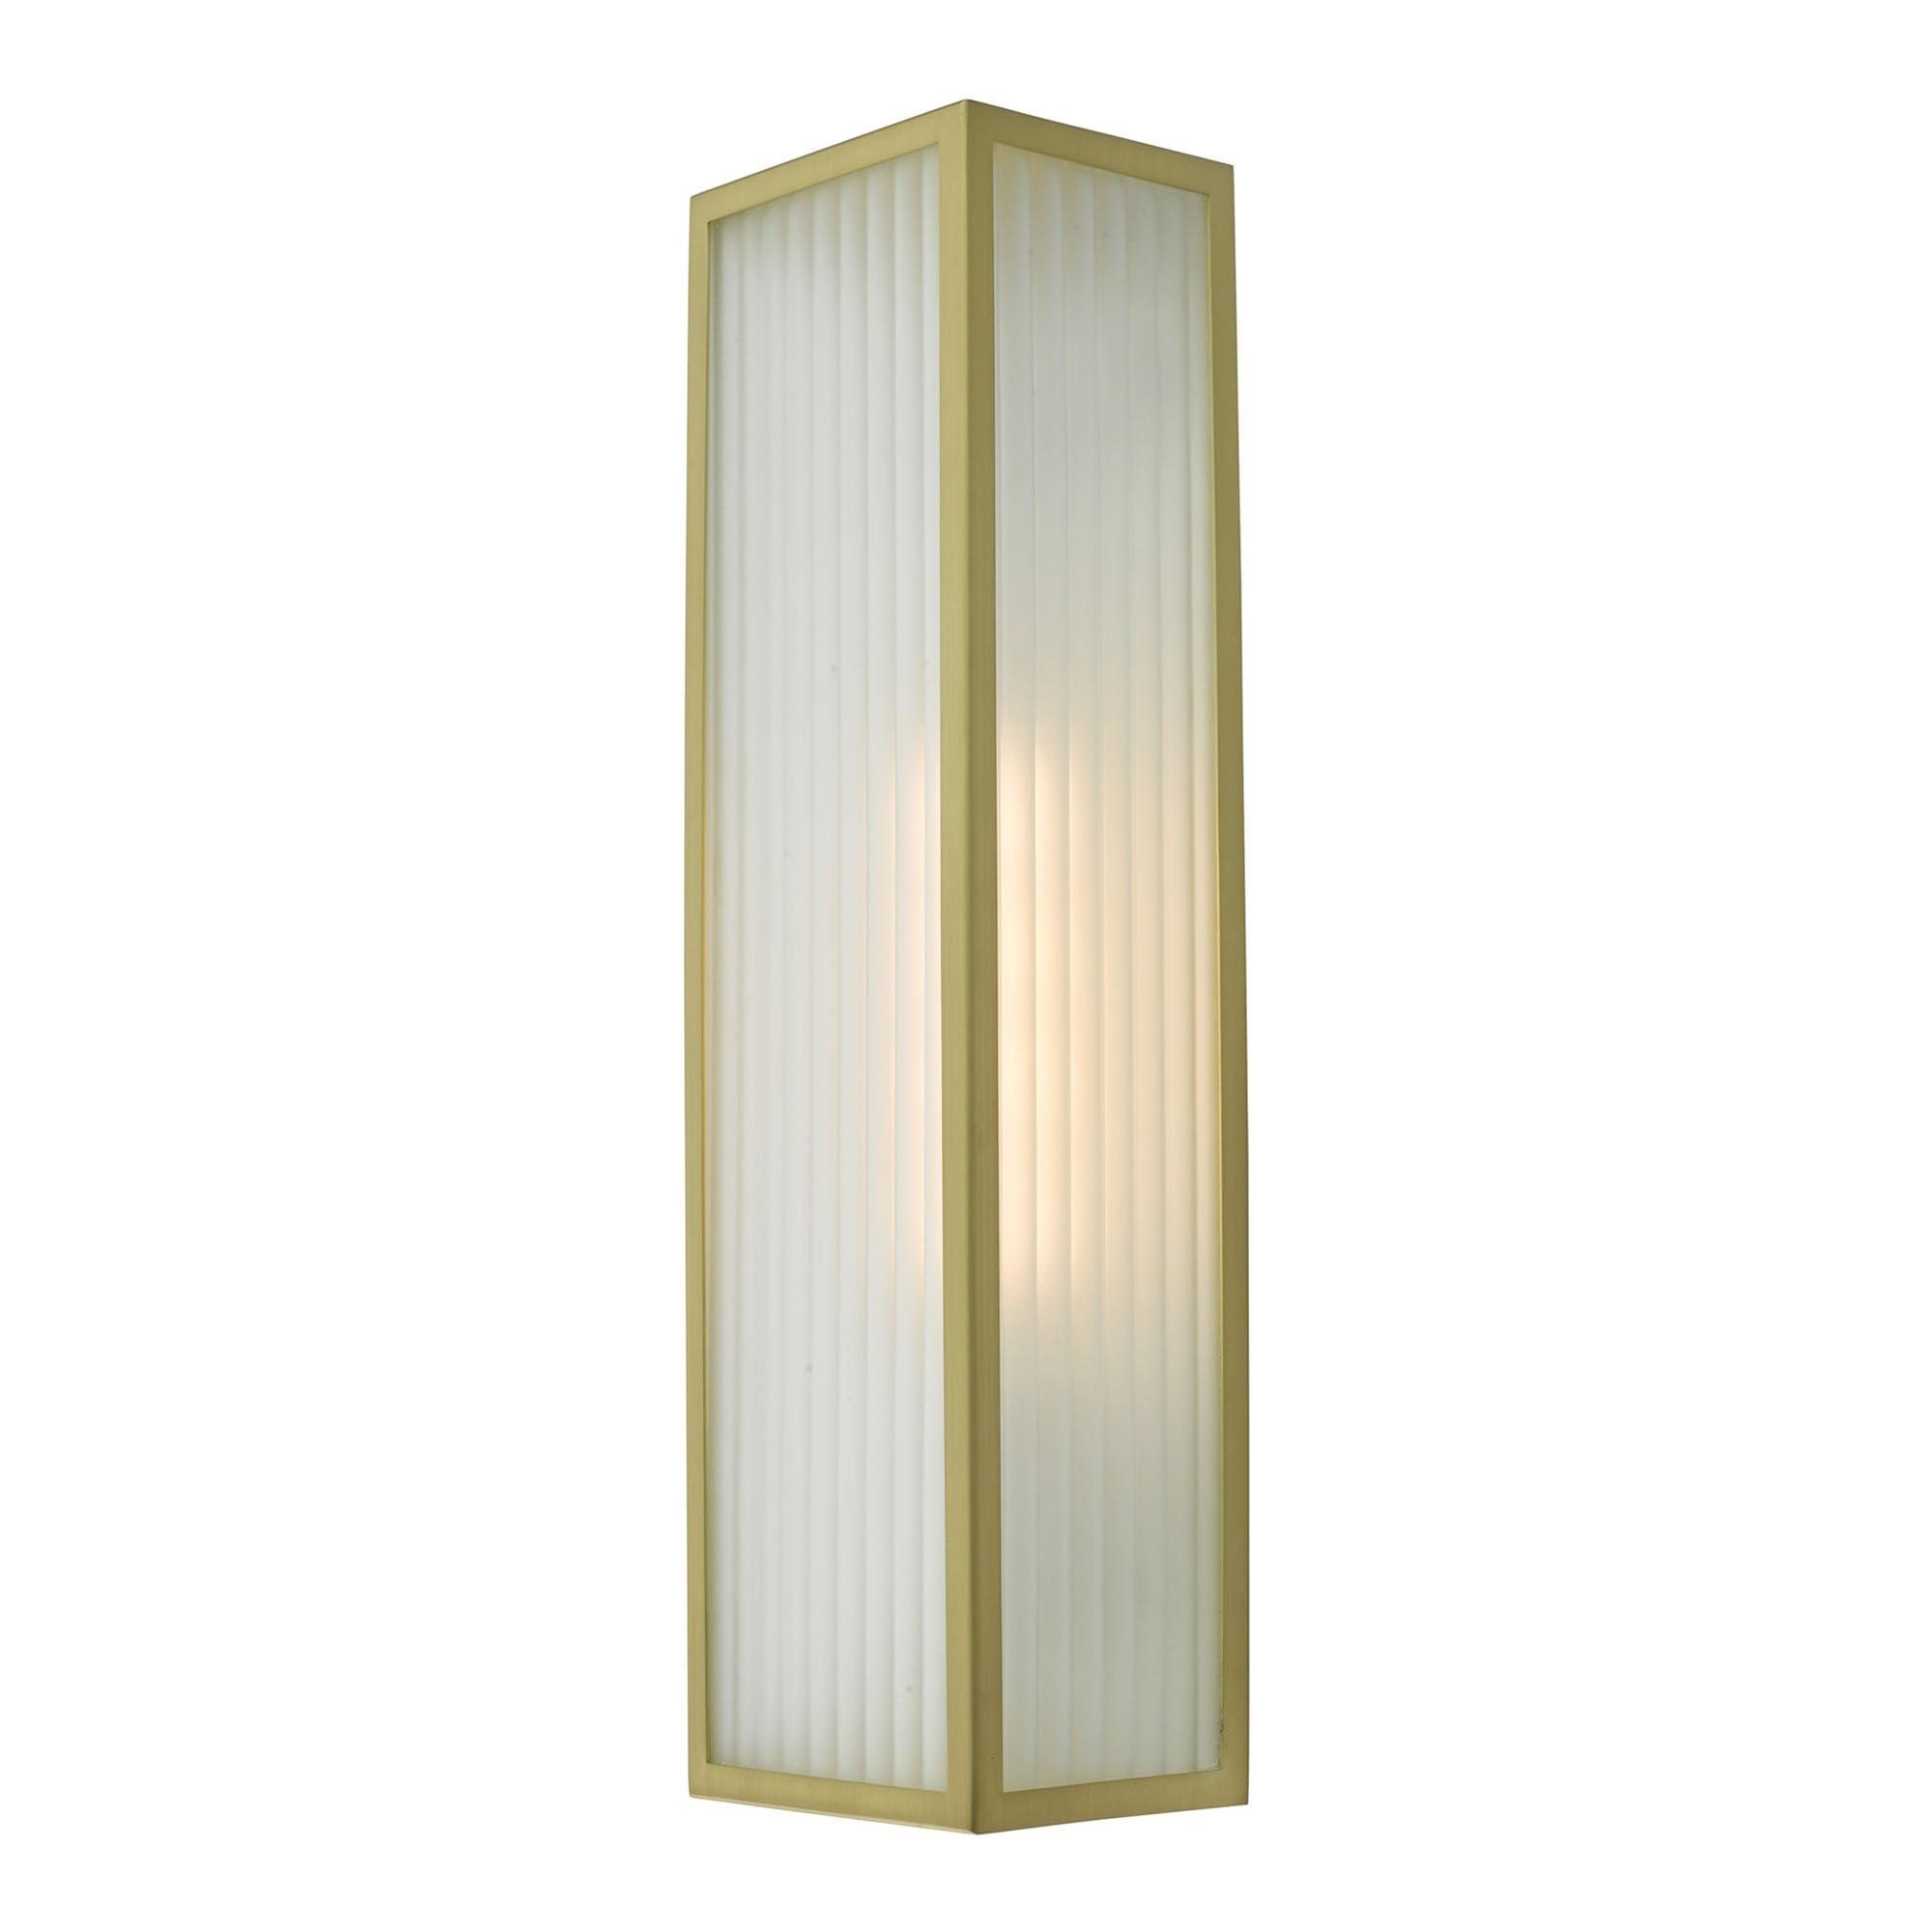 Keegan Bathroom Wall Light Satin Brass Ip44 Lighting And Lights Uk